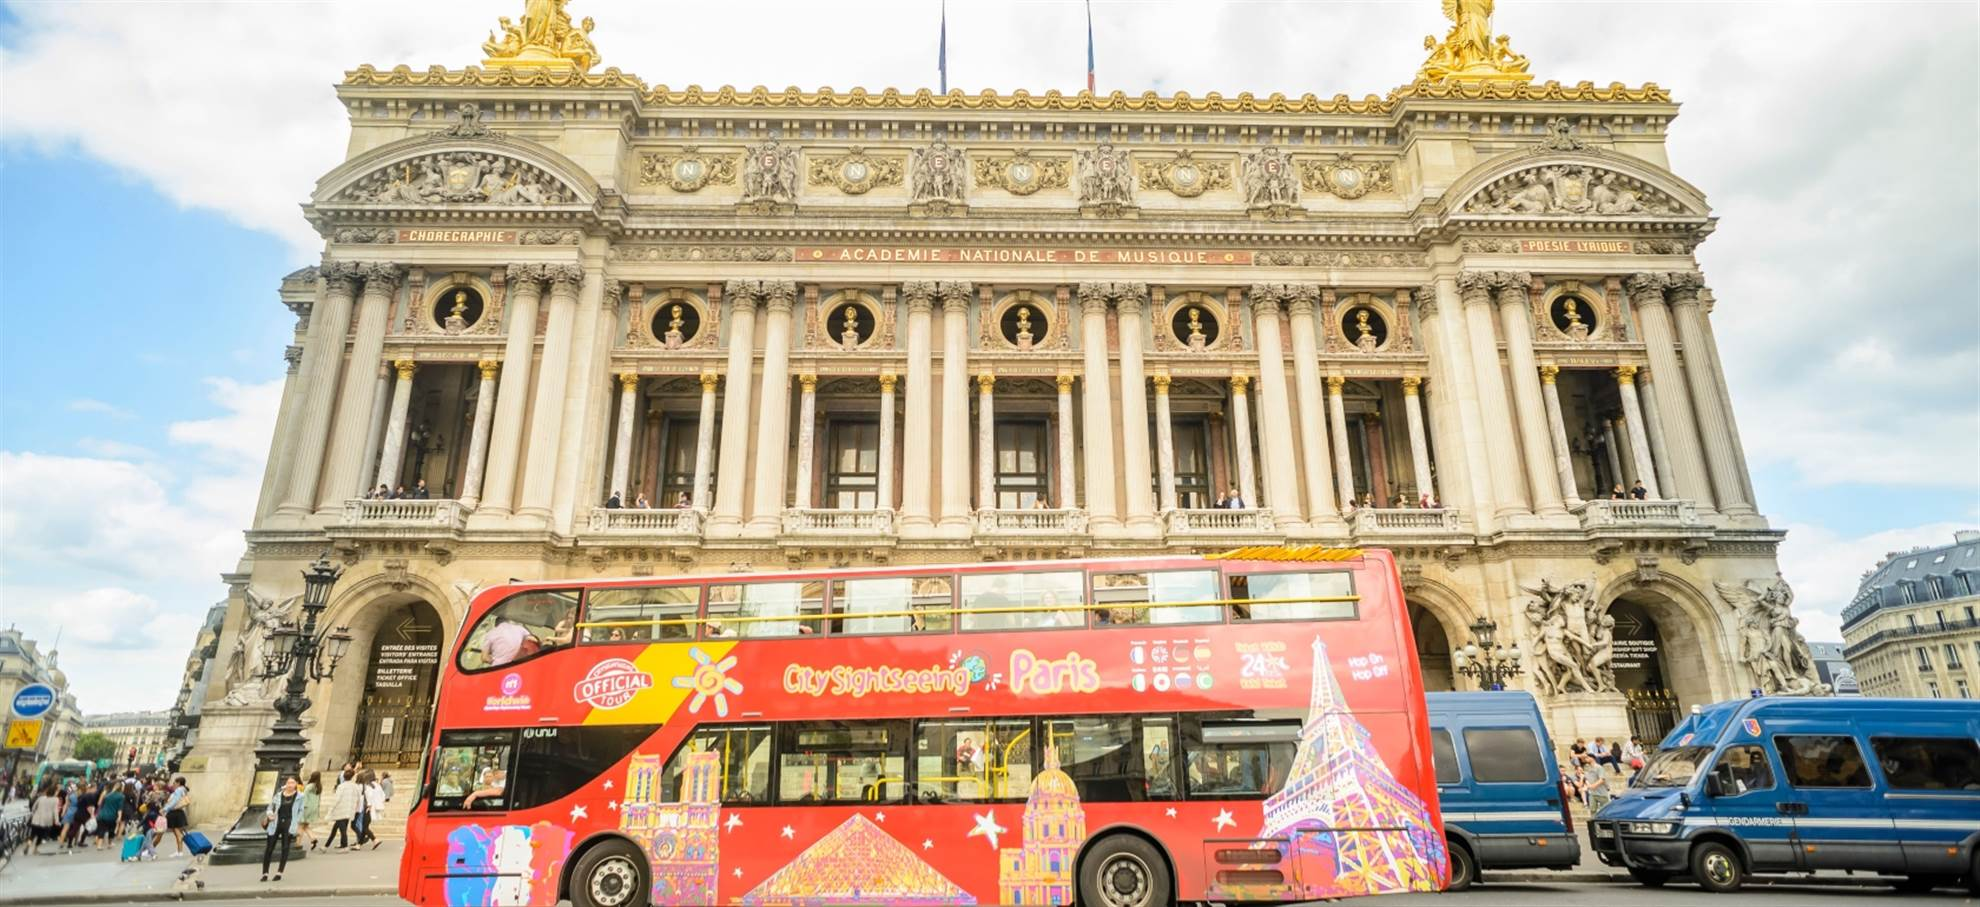 Parigi Hop on Hop off Bus